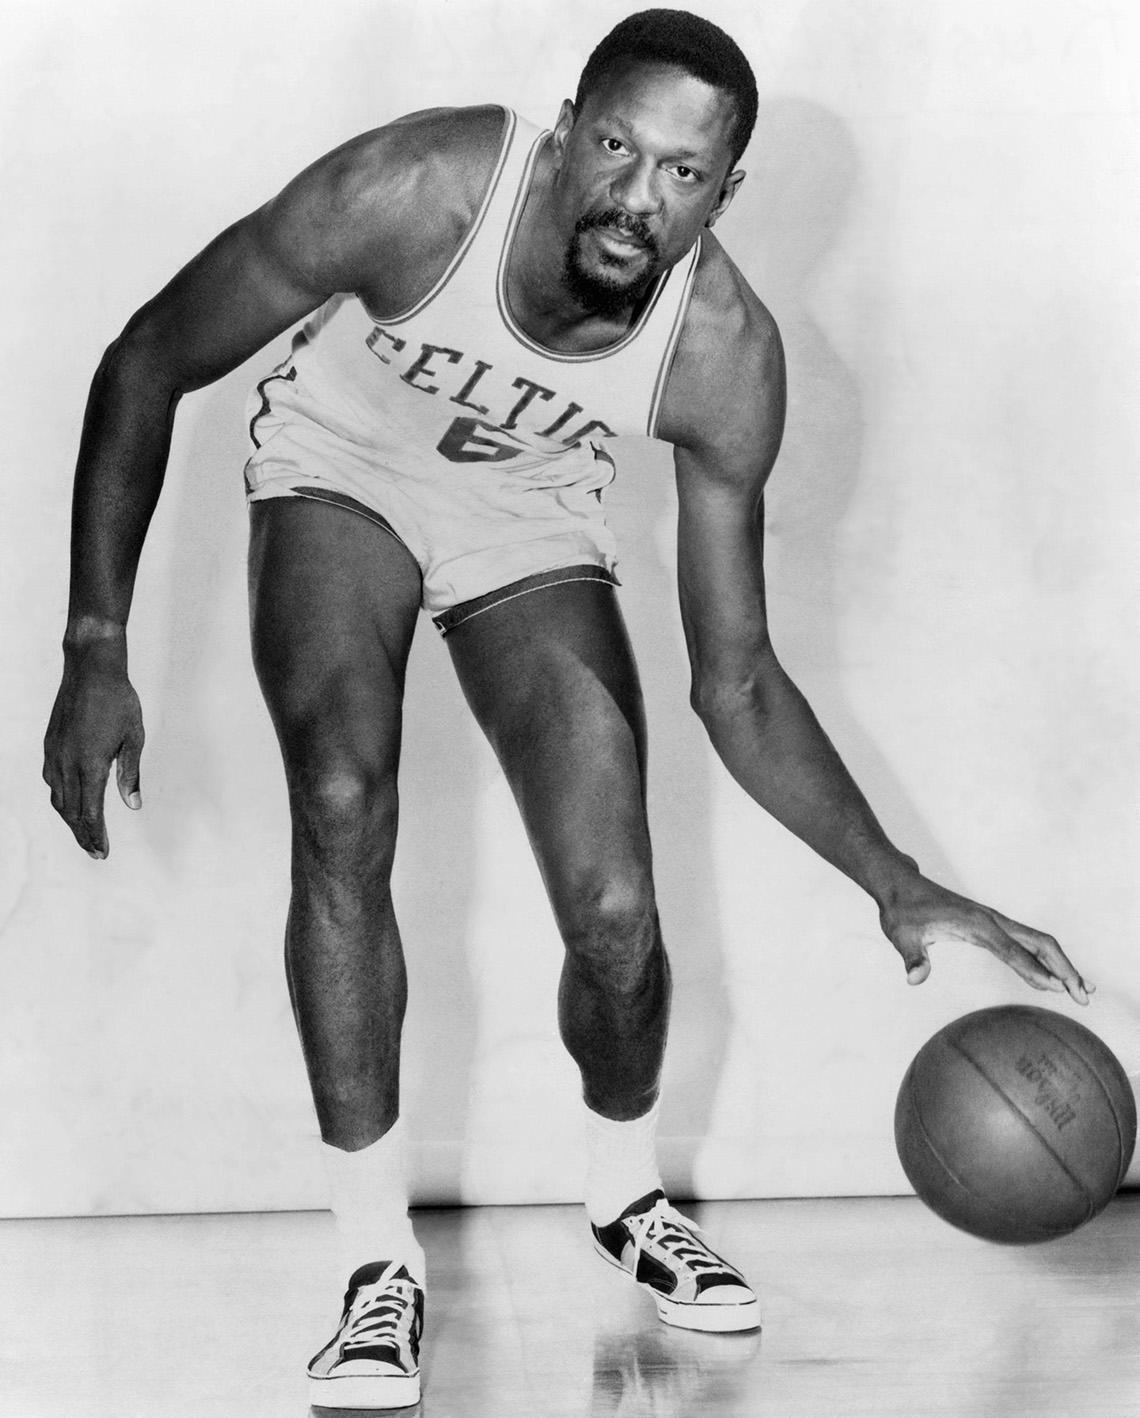 Boston Celtics basketball player Bill Russell dribbling a basketball